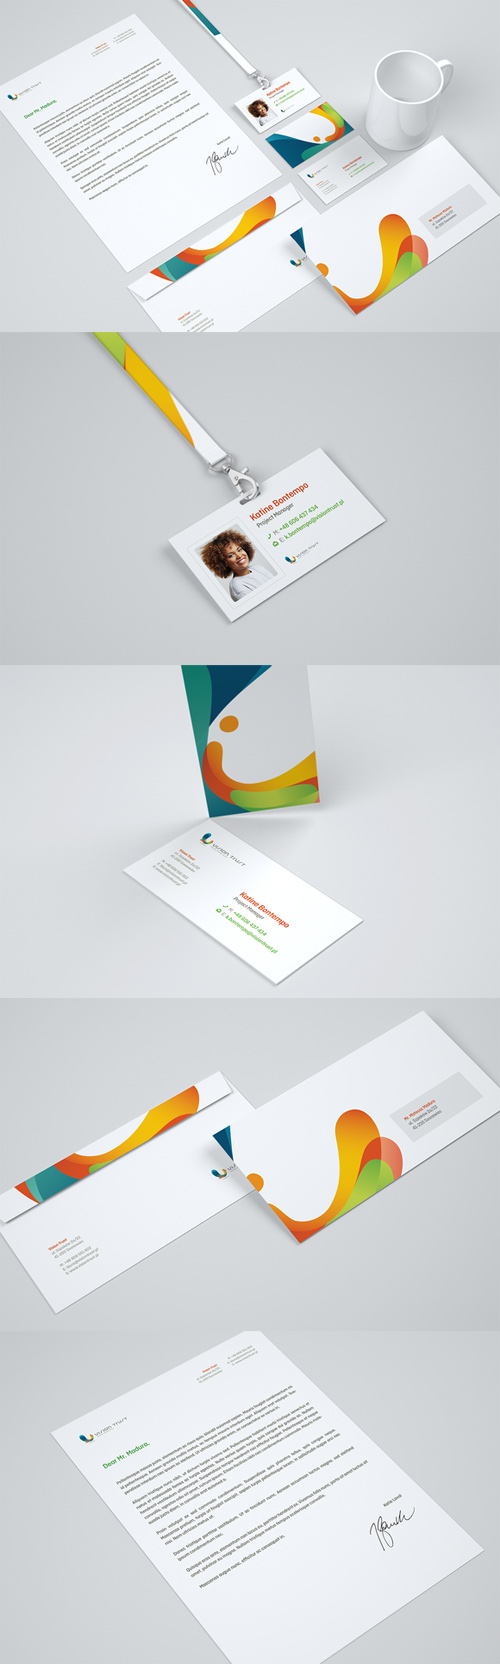 CreativeMarket - Mockup corporate identity 106176